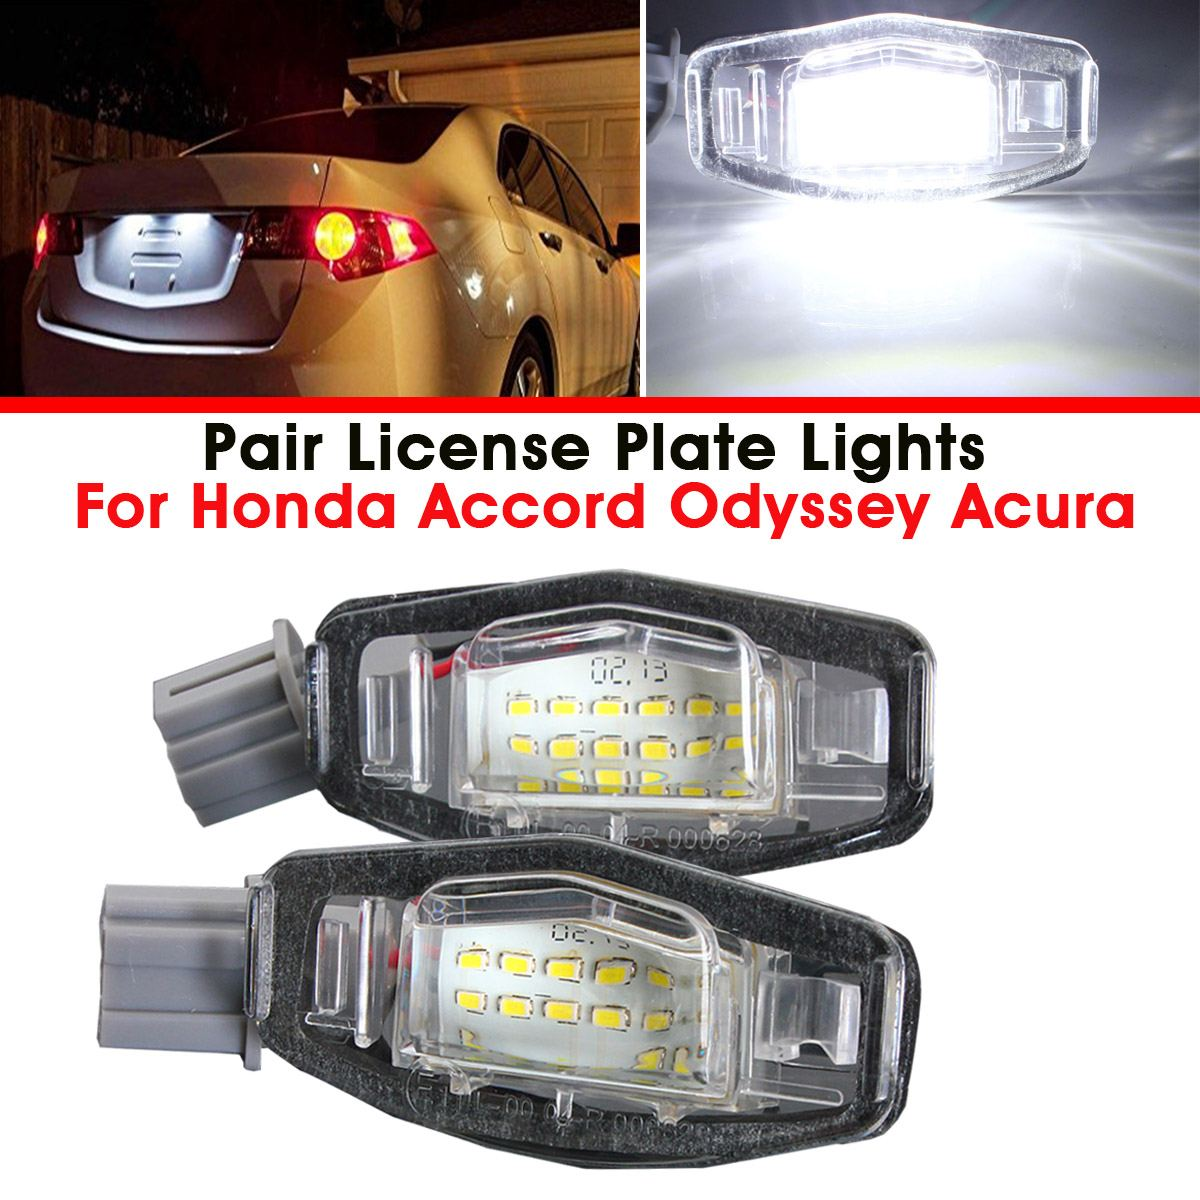 2X 18 LED Number License Plate Light Lamp Error Free For Honda Accord Odyssey Civic Sedan City Acura MDX TSX ILX RDX RL TL